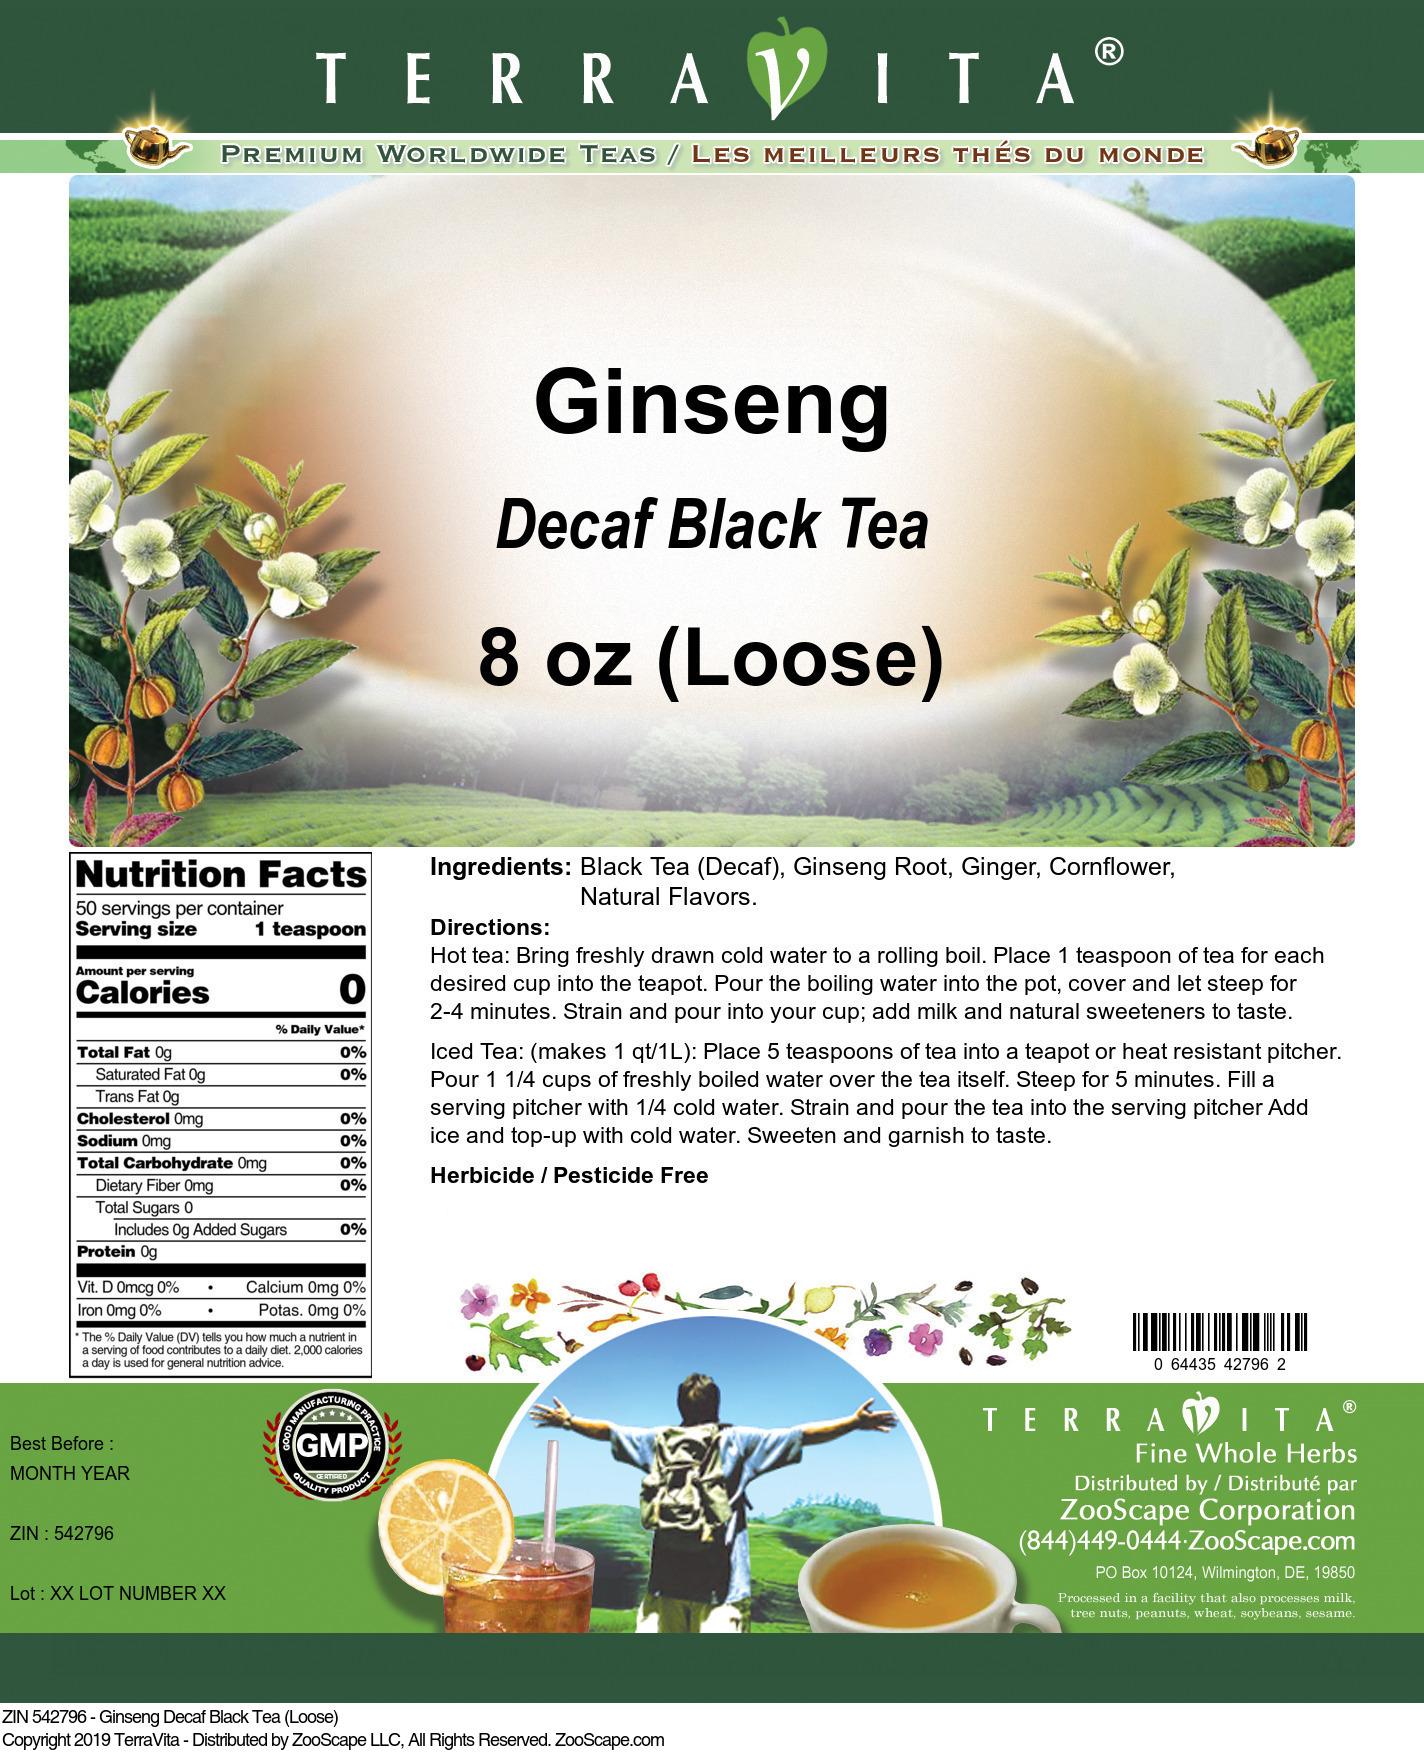 Ginseng Decaf Black Tea (Loose)